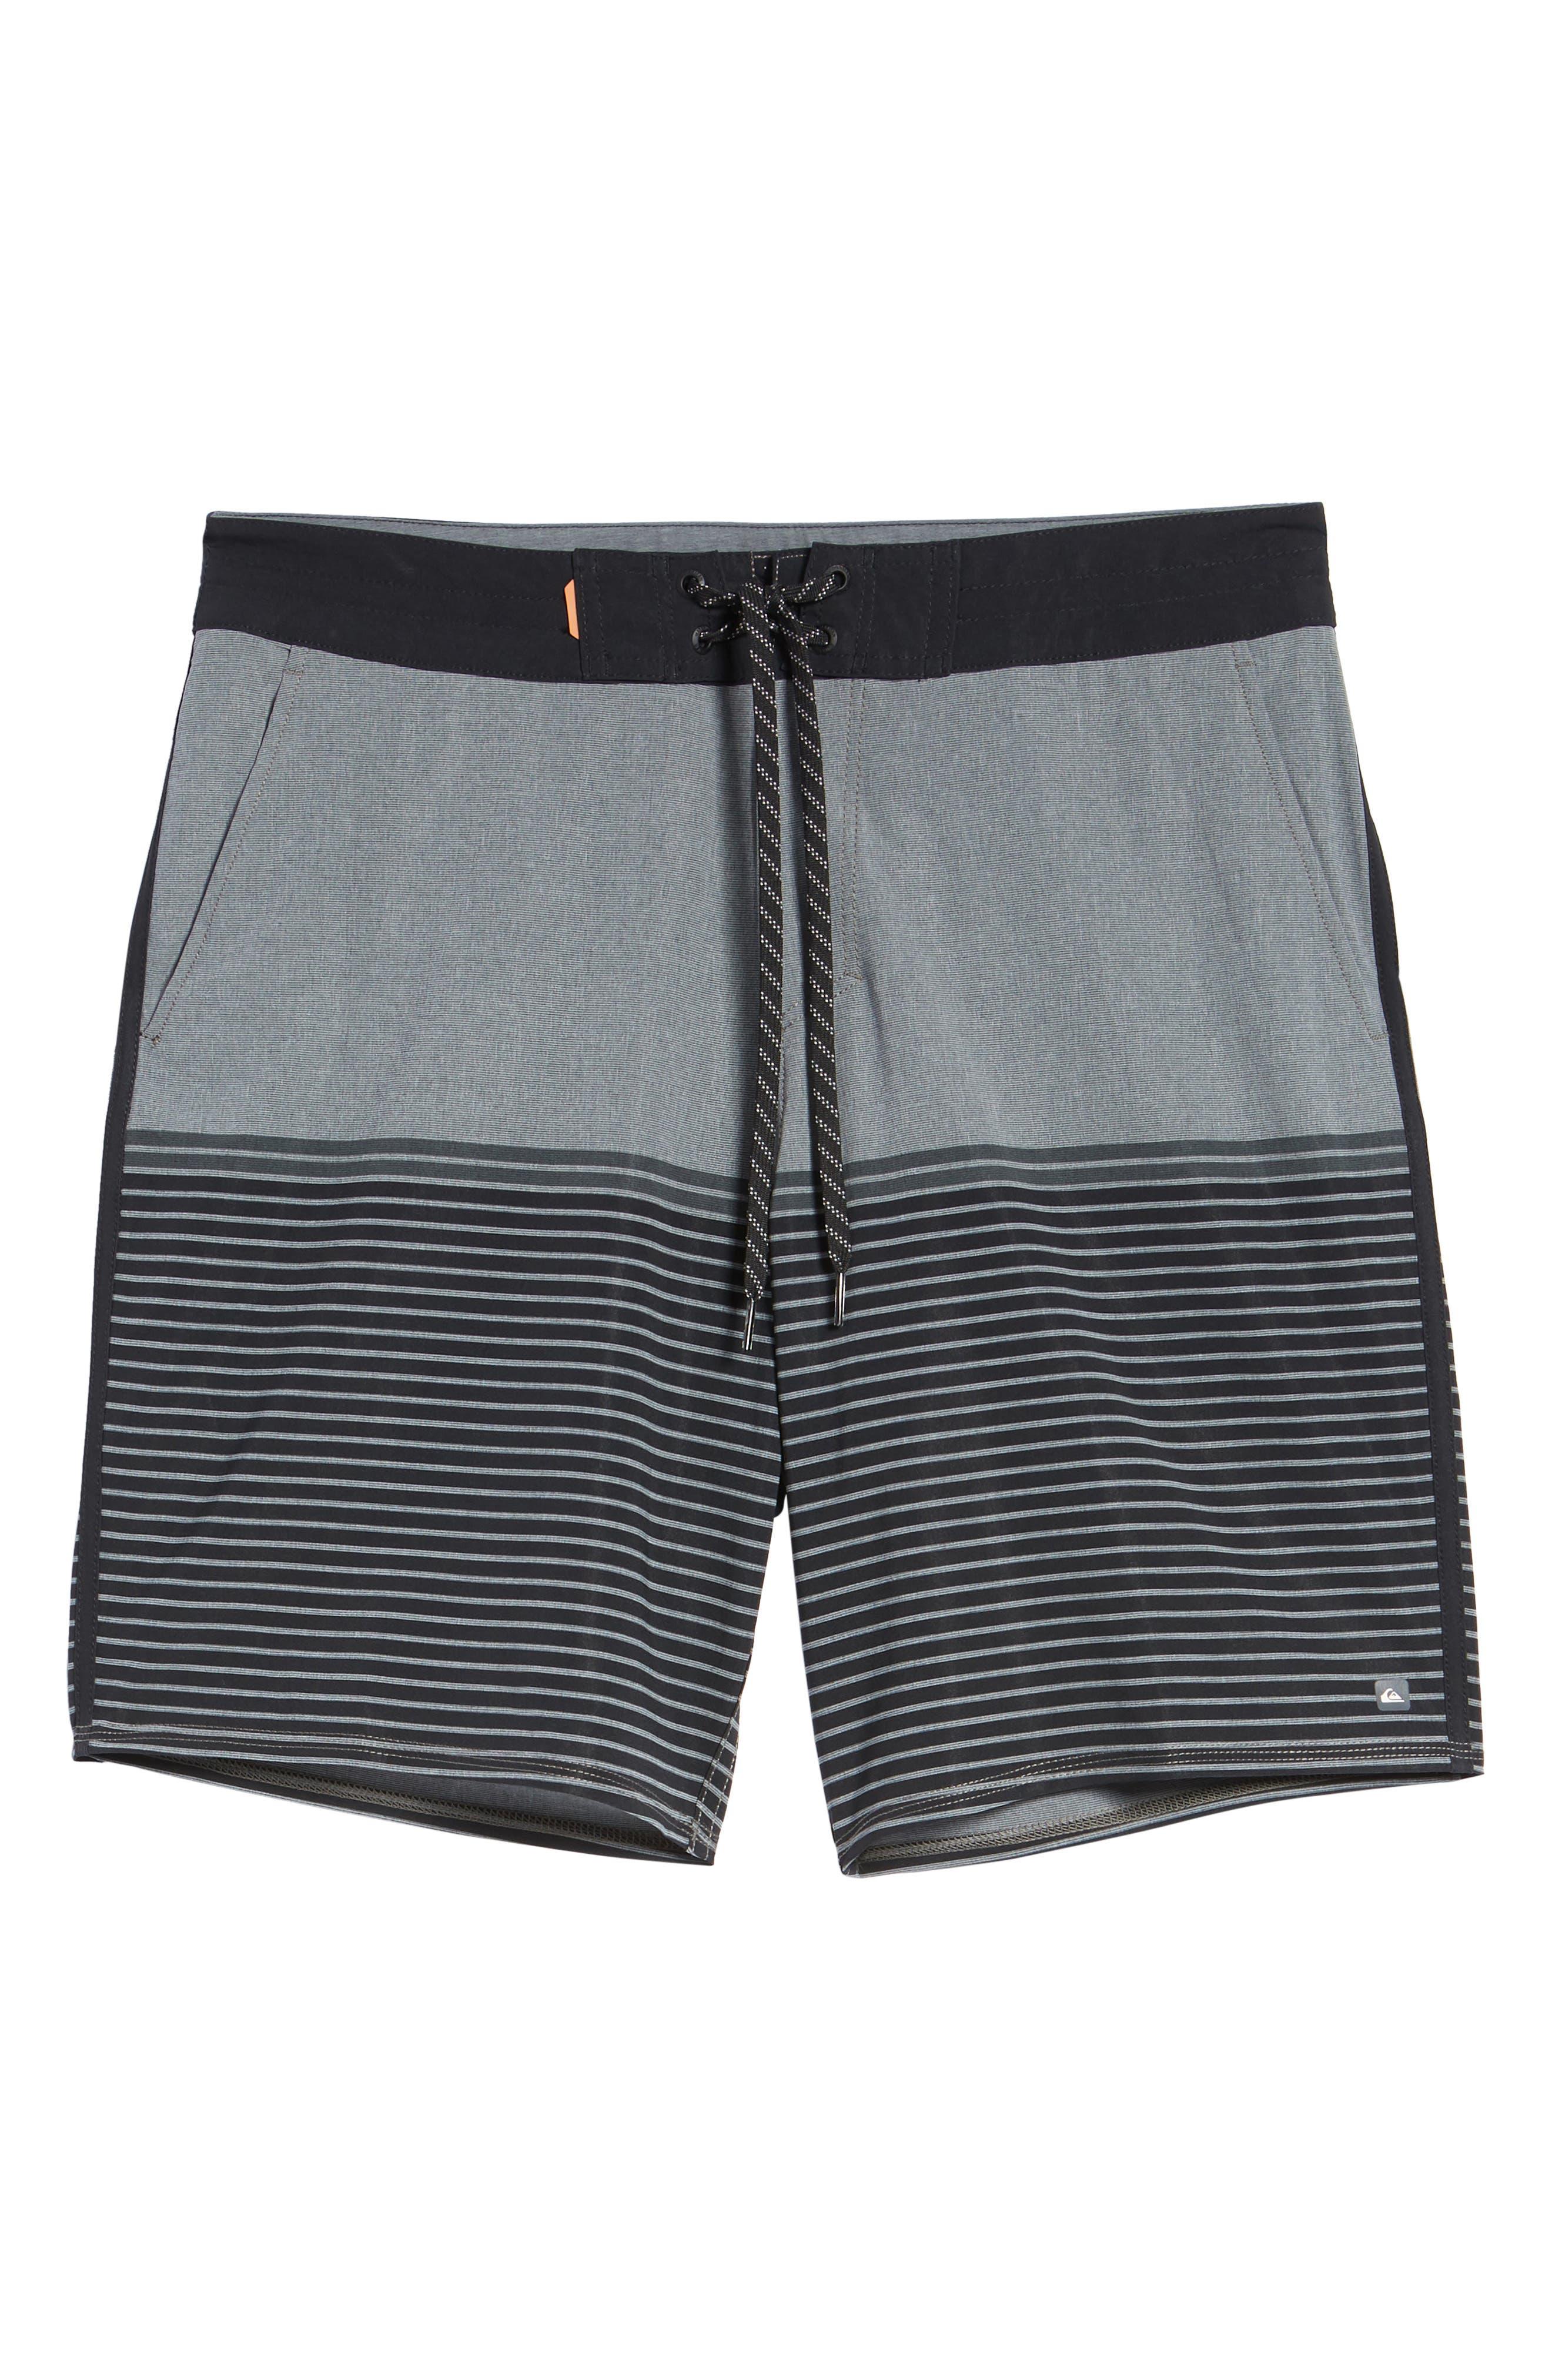 Liberty Stripe Board Shorts,                             Alternate thumbnail 6, color,                             DARK SHADOW